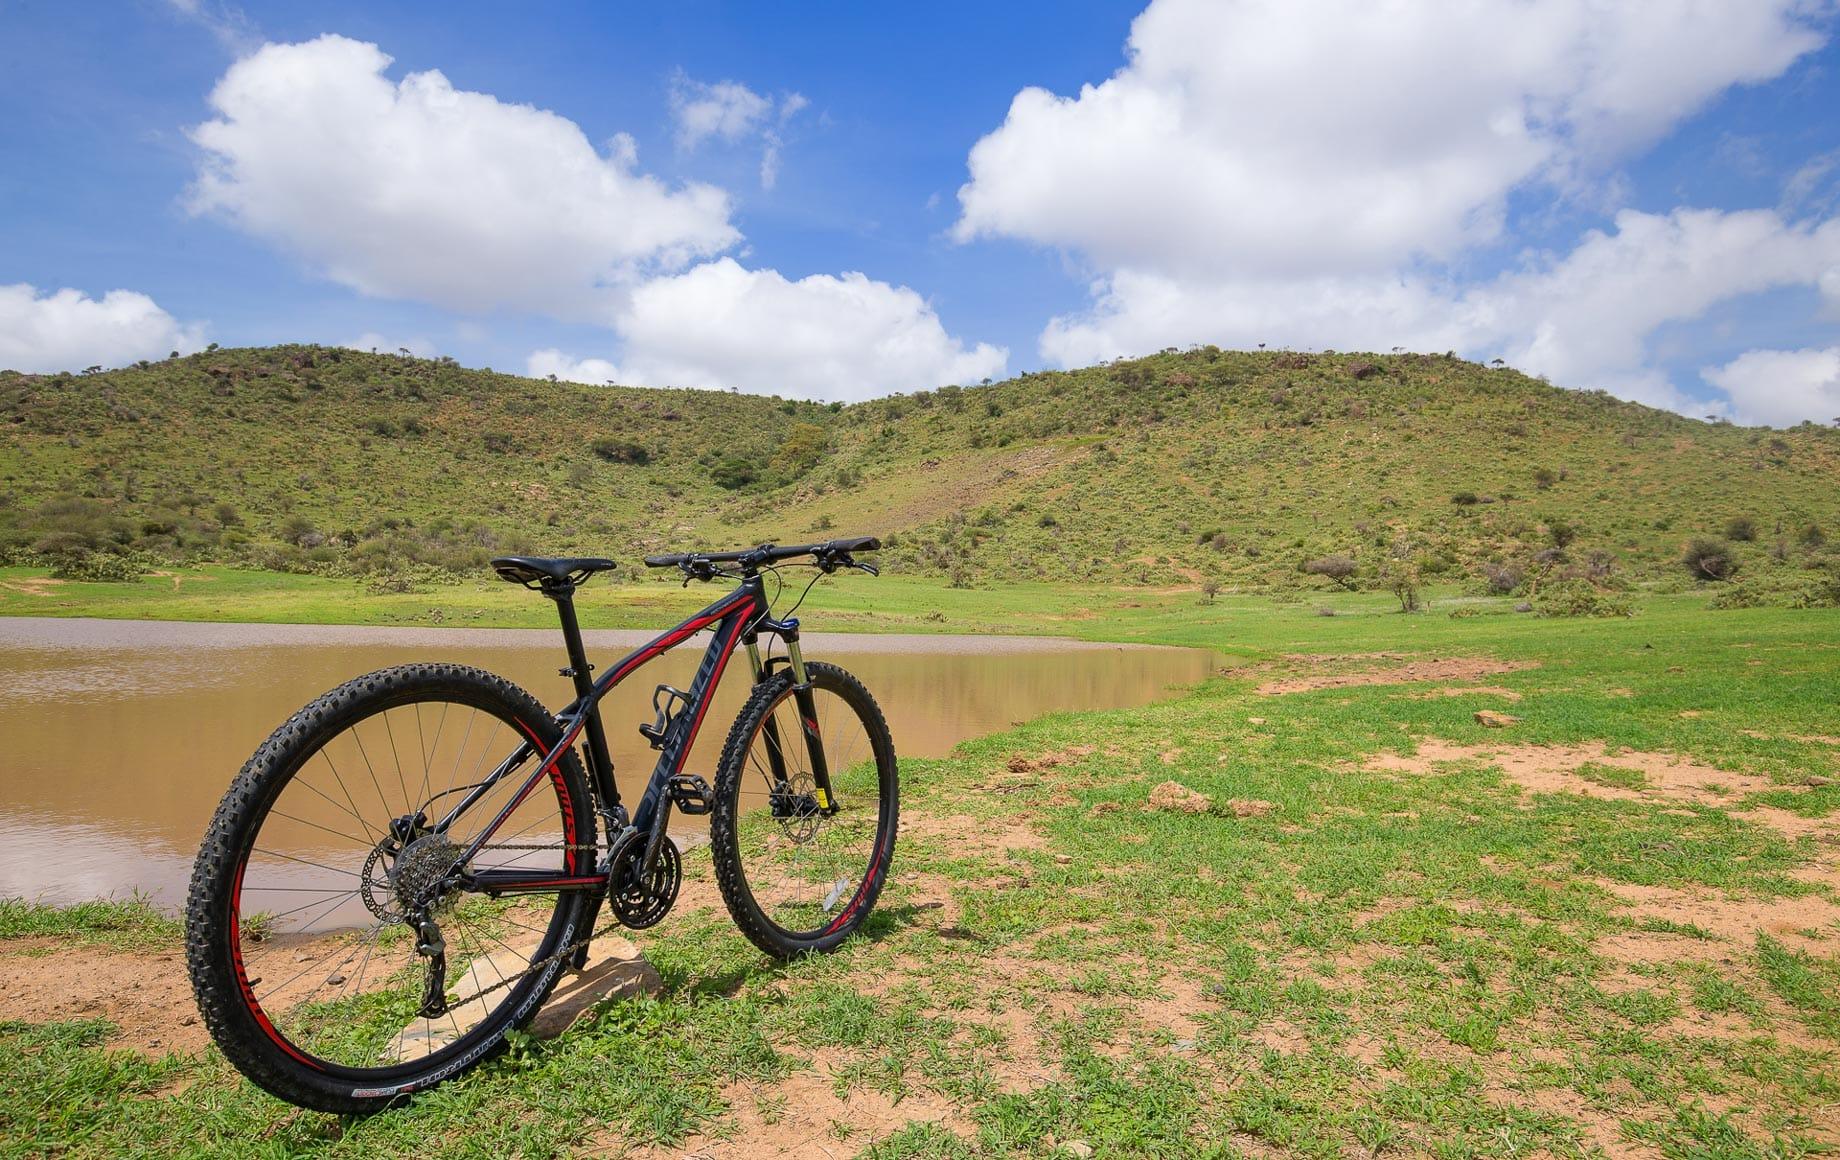 Bike riding in Laikipia Plateau